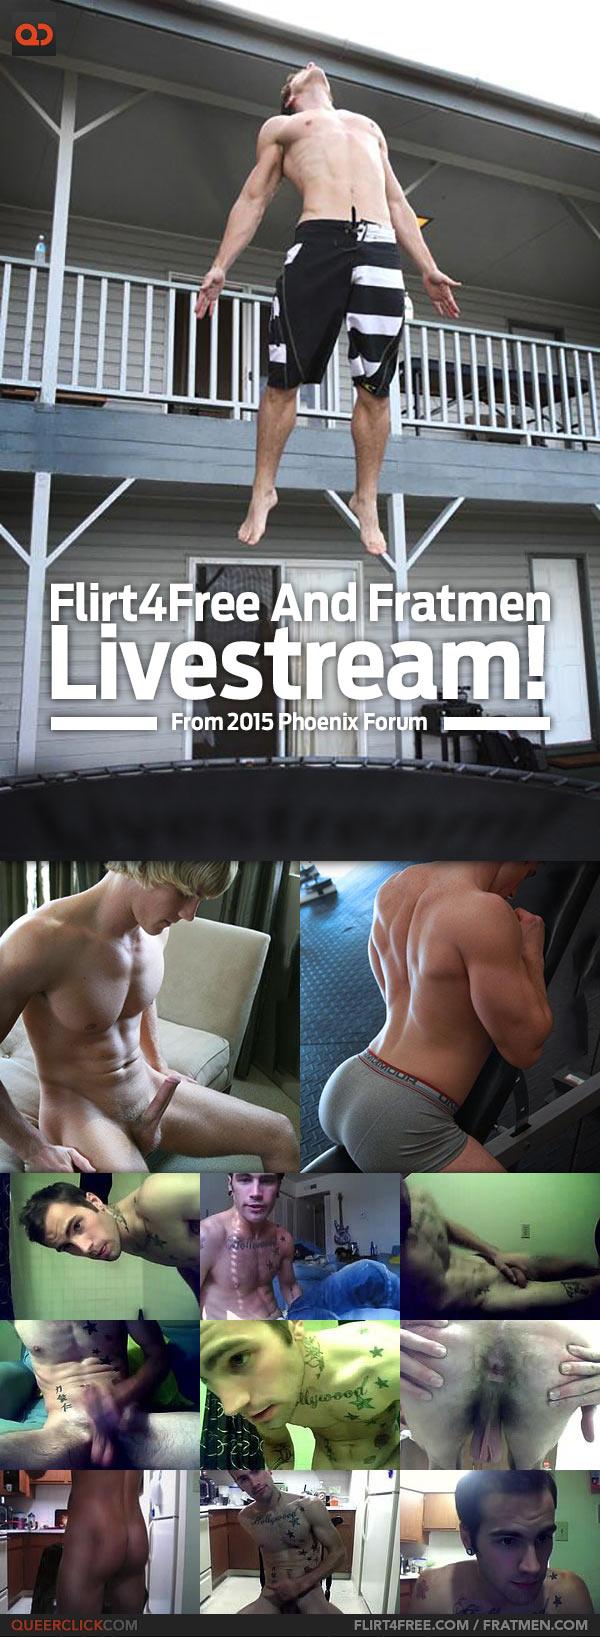 Flirt4Free And Fratmen Livestream From 2015 Phoenix Forum